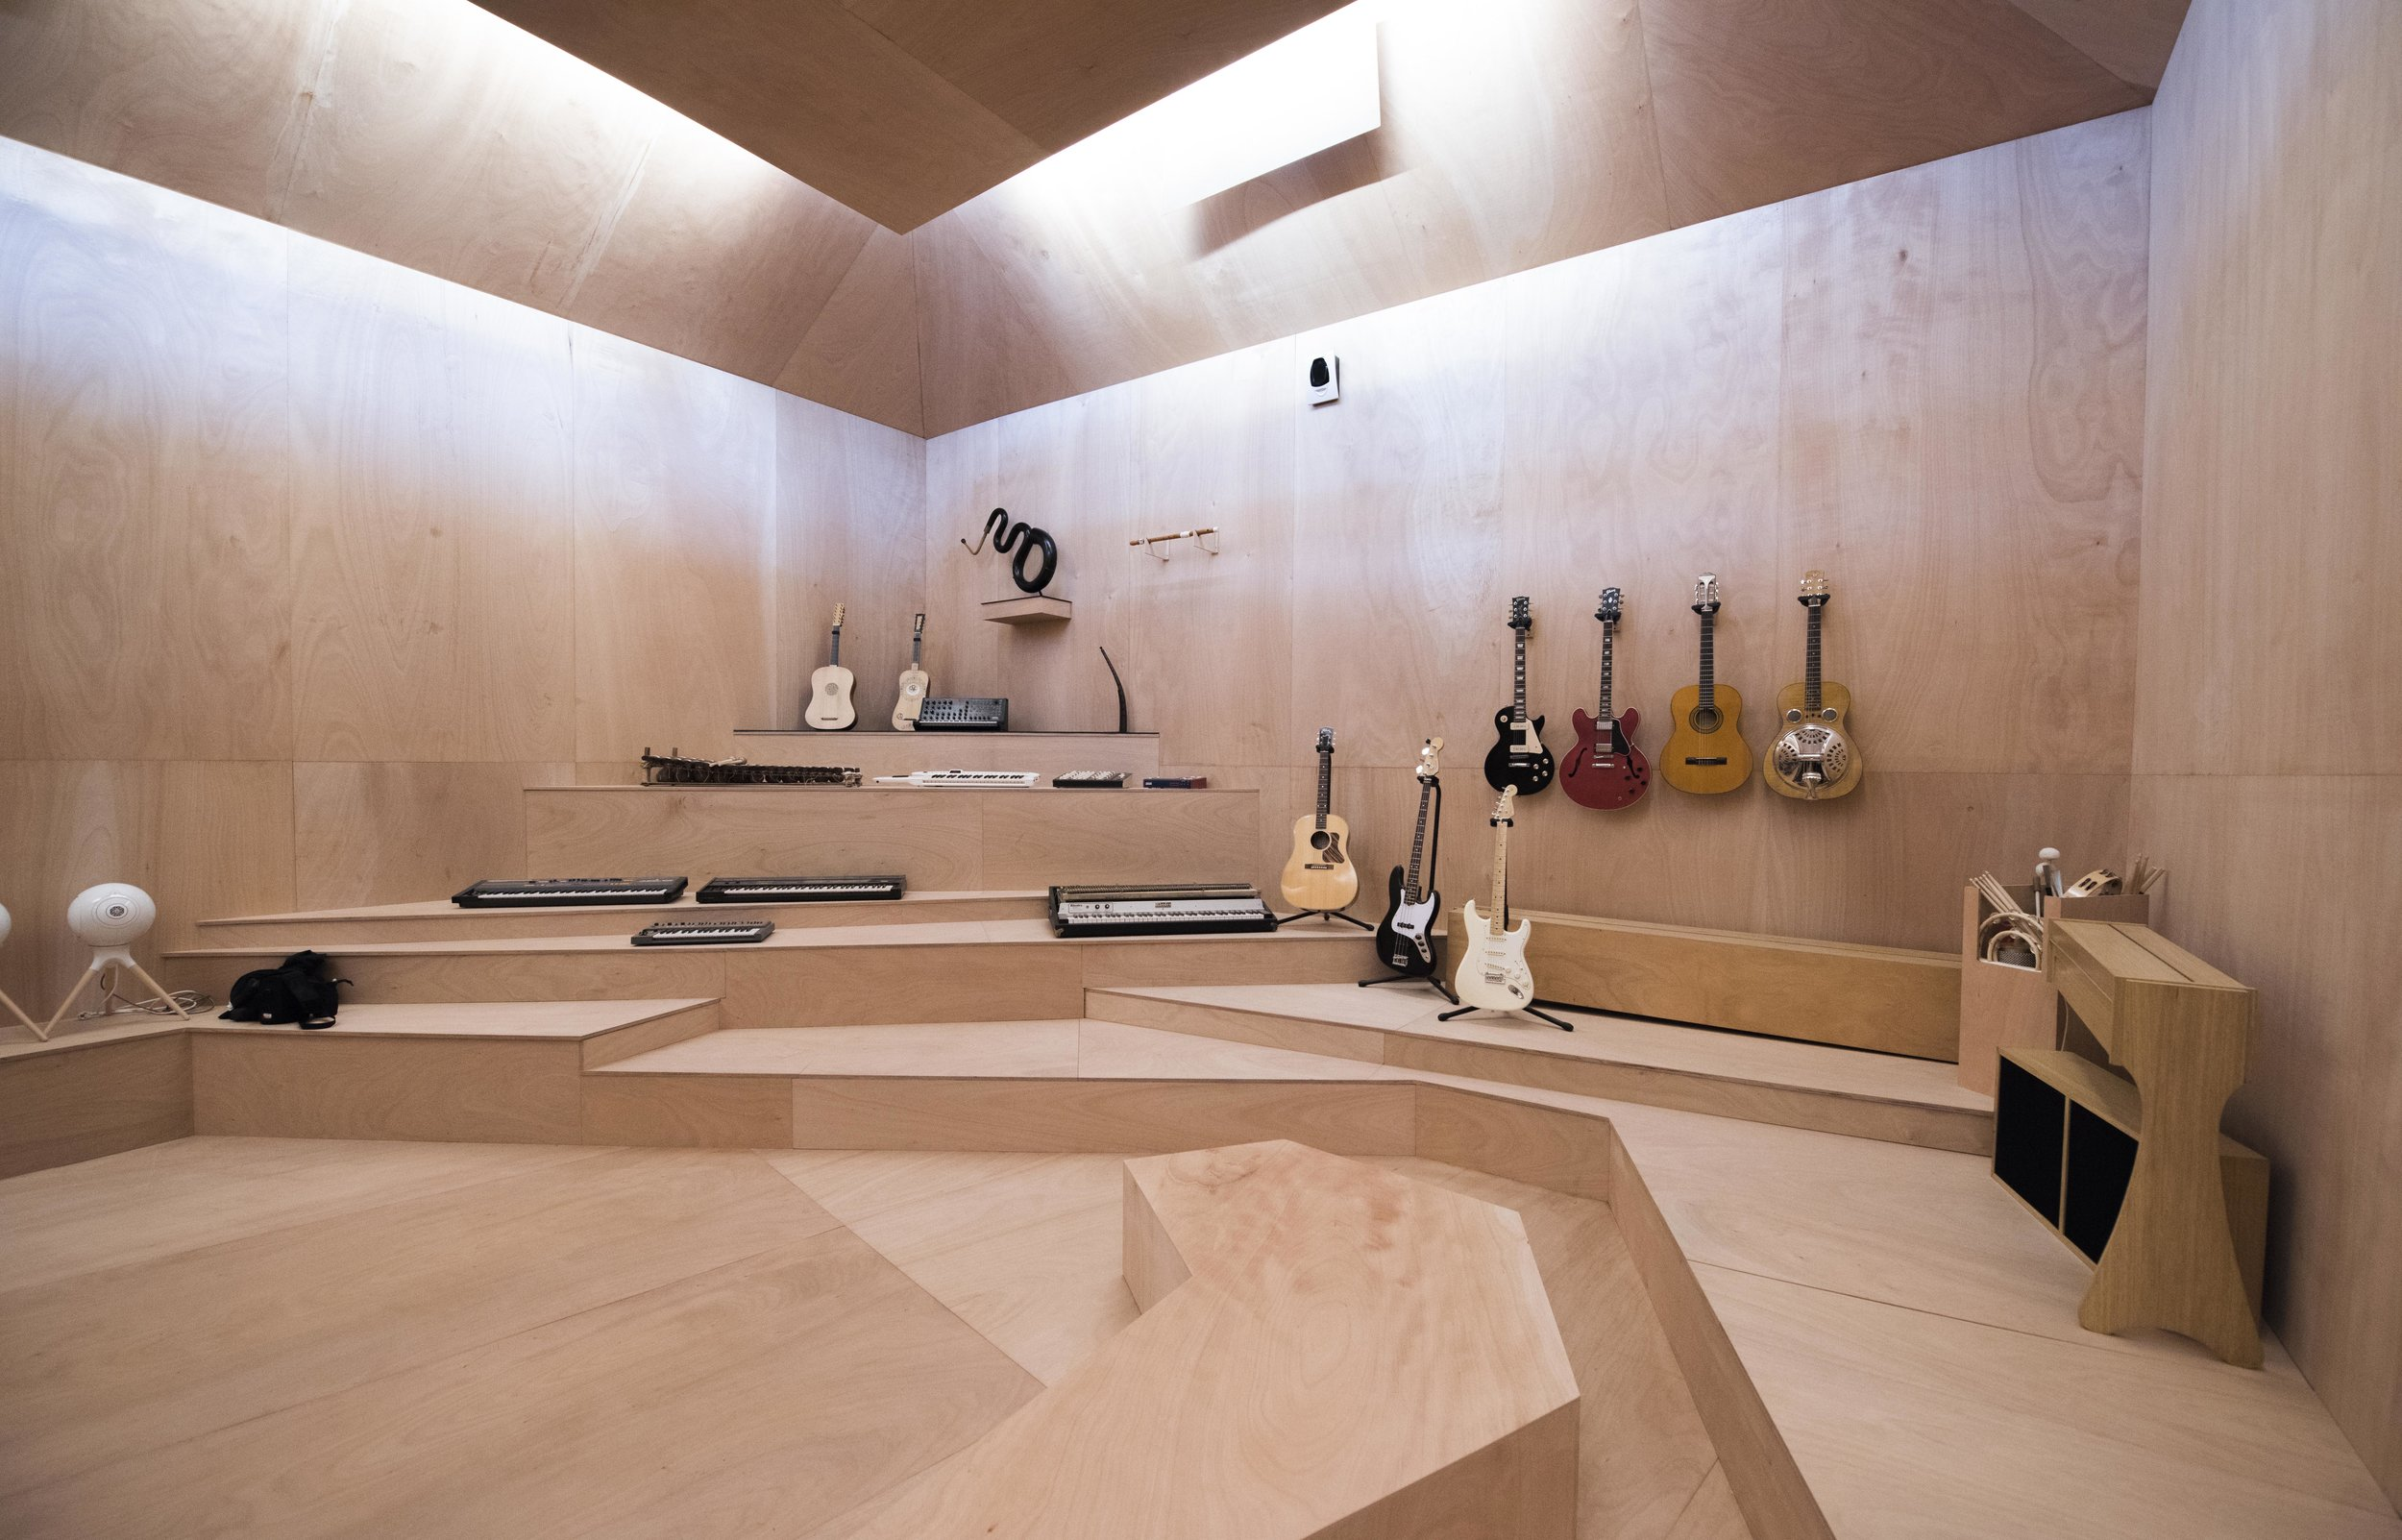 "Xavier Veilhan, Studio Venezia (2017) Installation view (""The Green Room"") French Pavilion, Biennale di Venezia Photo © Giacomo Cosua © Veilhan / ADAGP, Paris, 2017"